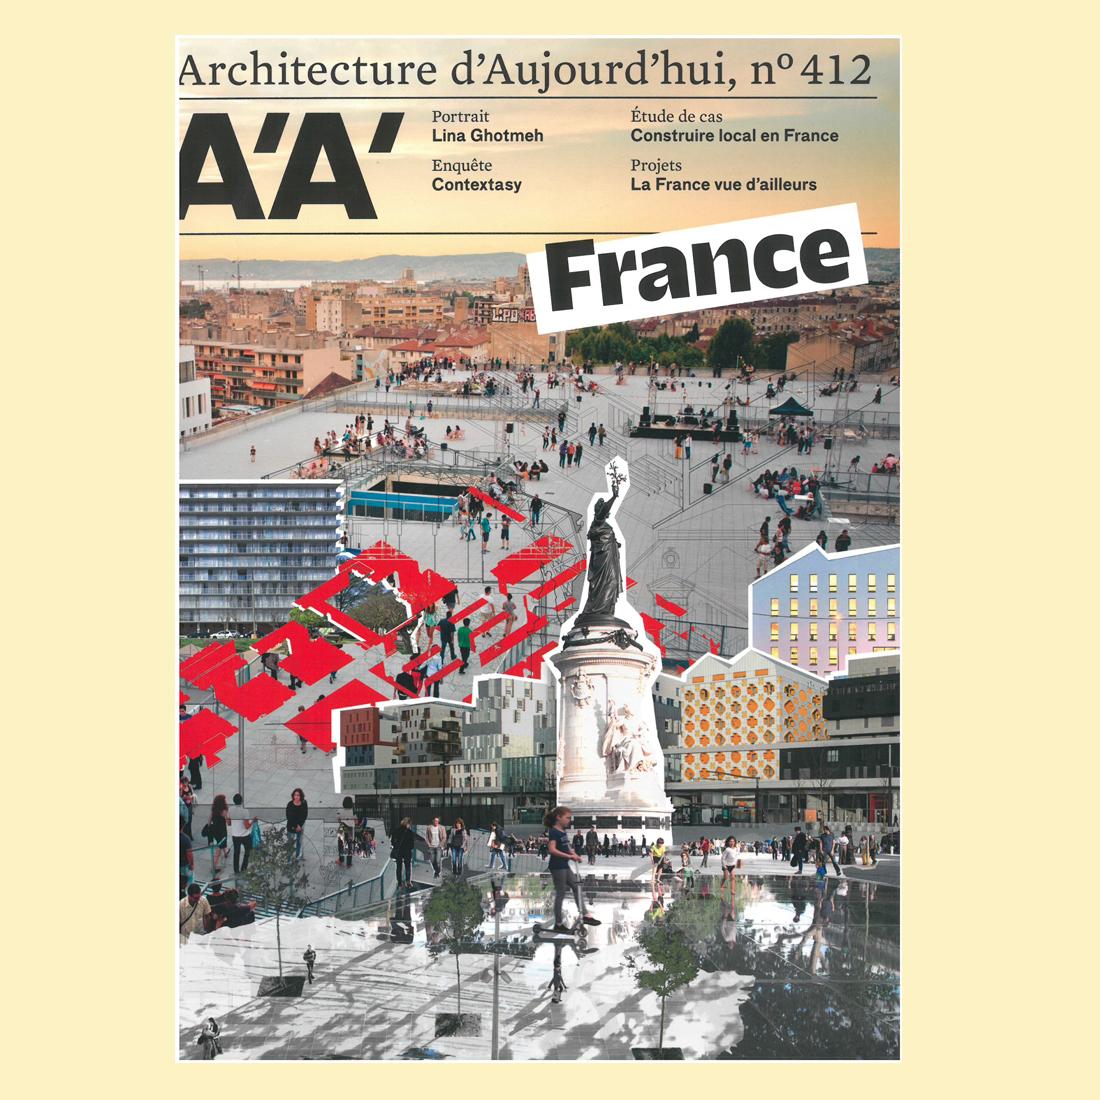 'A'A N°412 | Brenac & Gonzalez et Associés